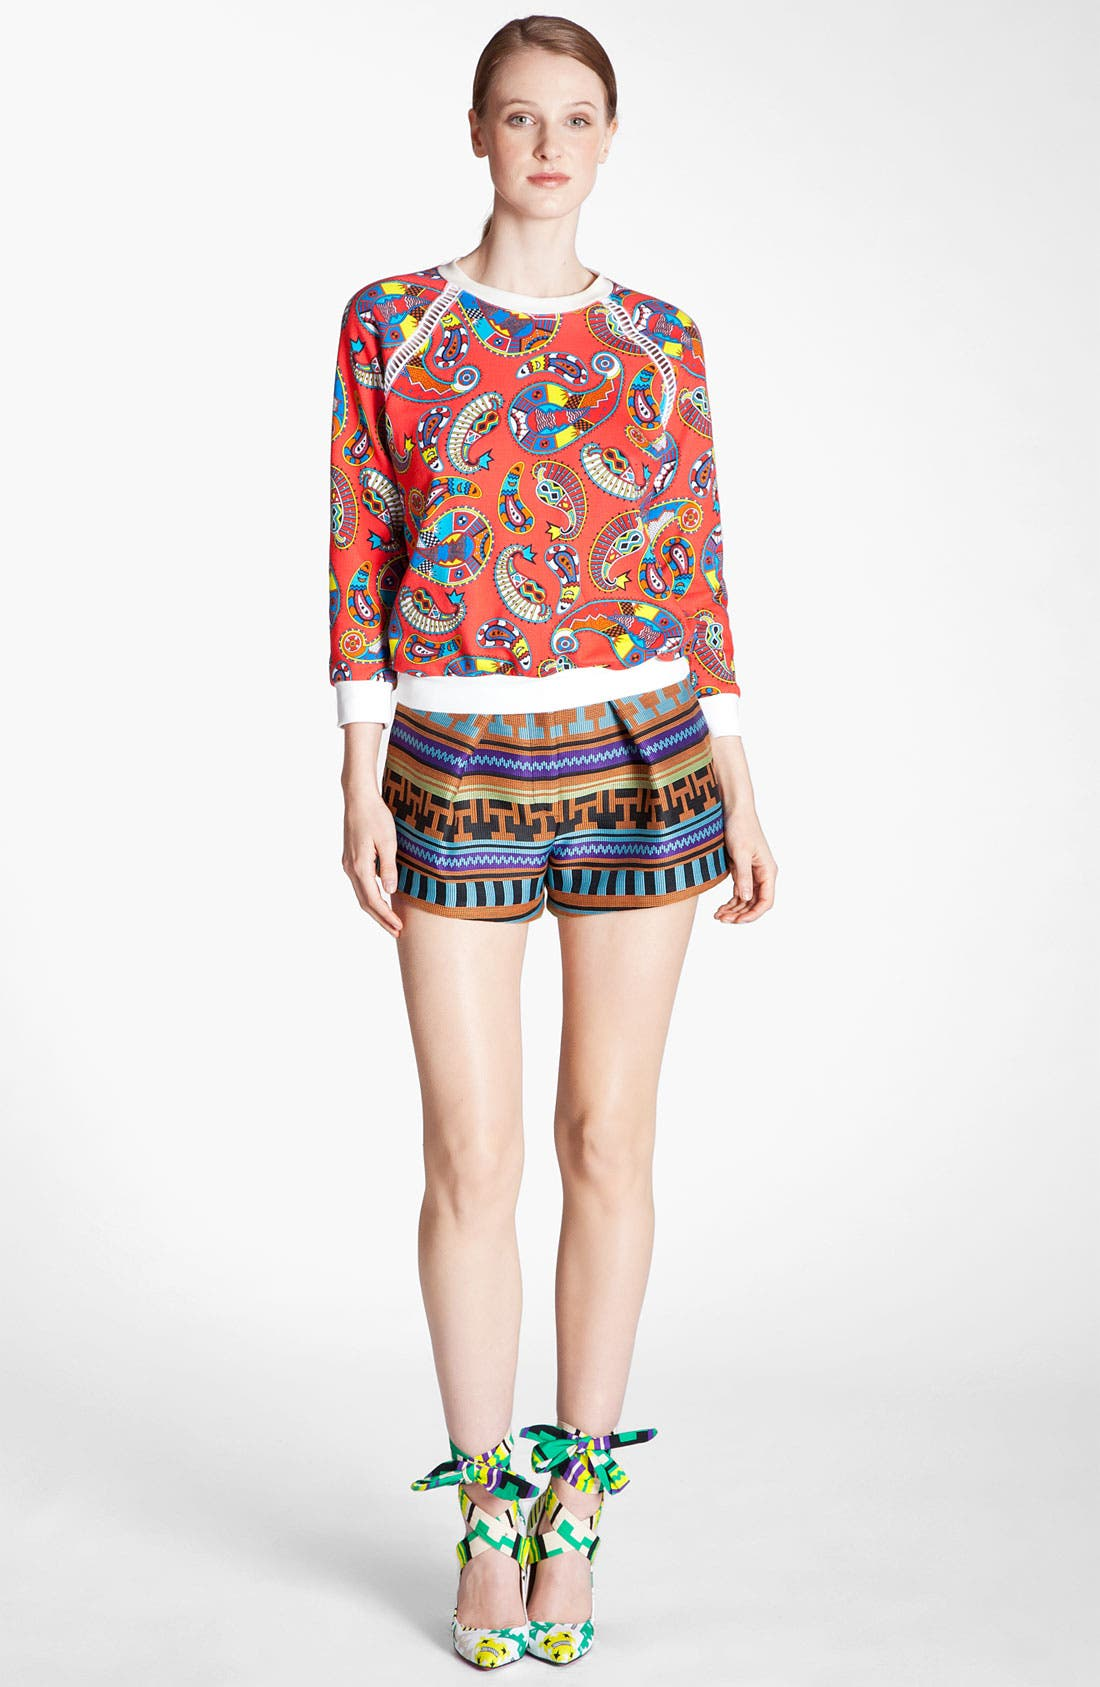 Alternate Image 1 Selected - MSGM 'Paisley Memphis Print' Sweatshirt